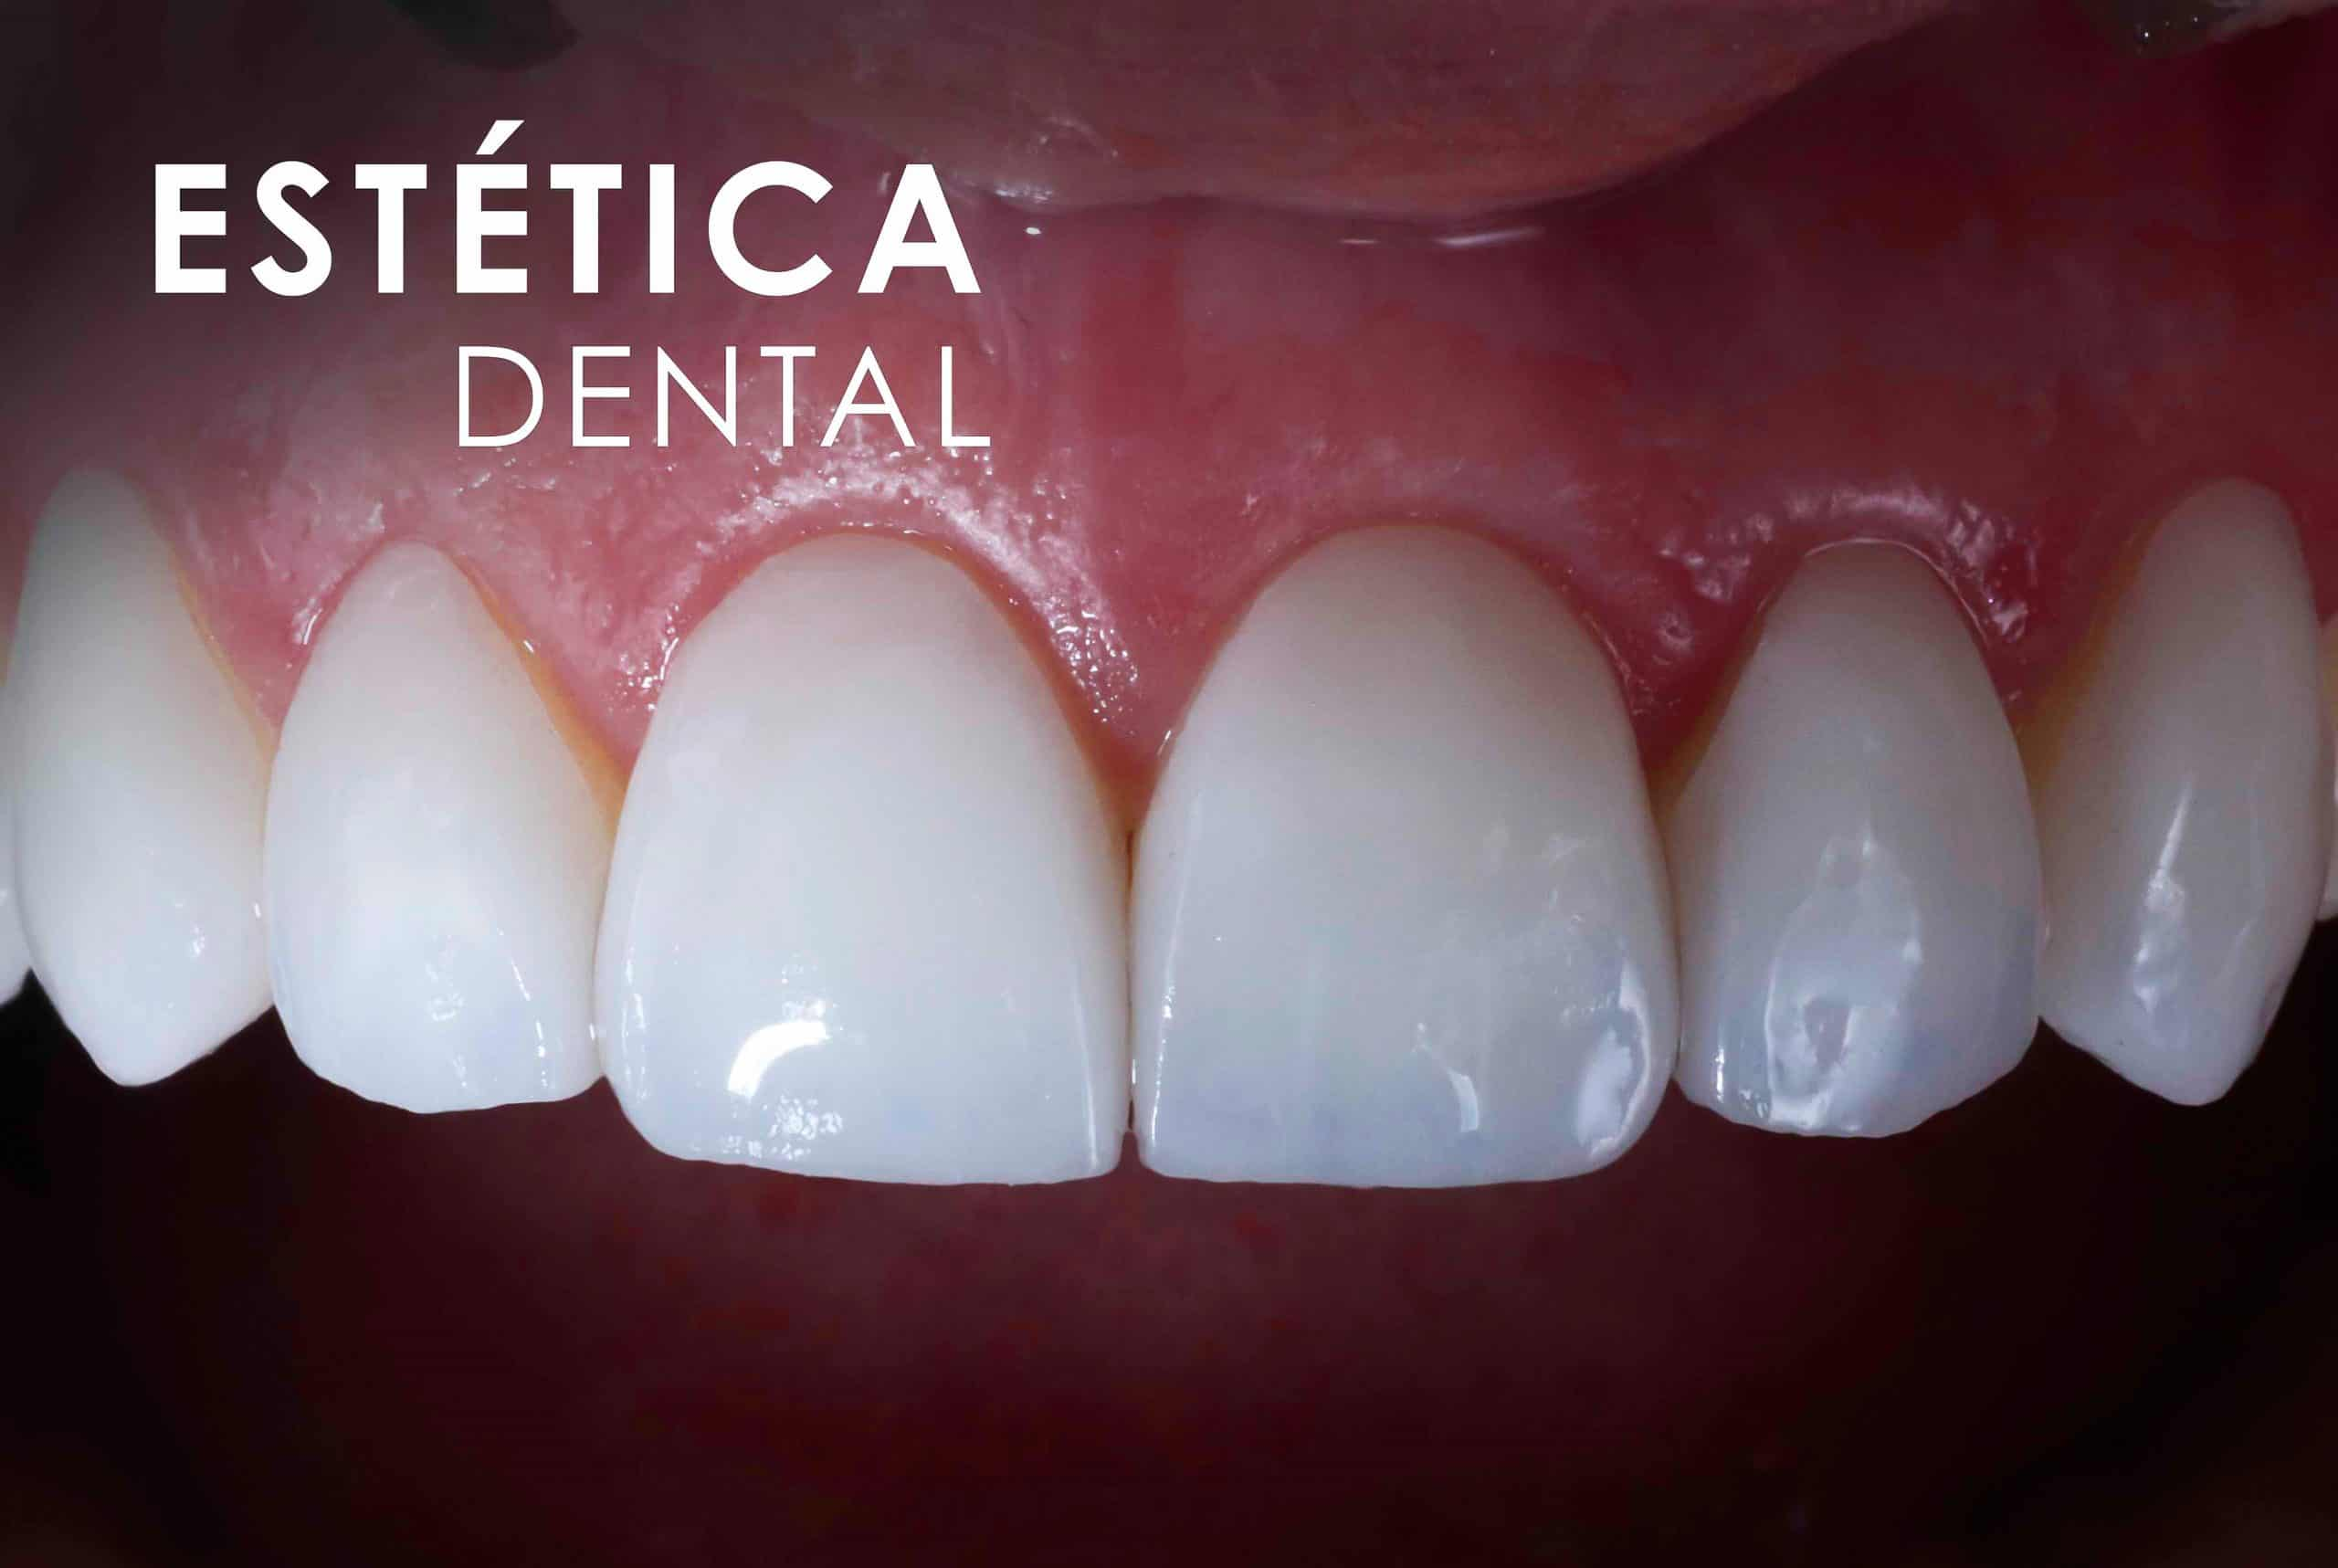 Estética Dental Clínica Dental Bernabeu